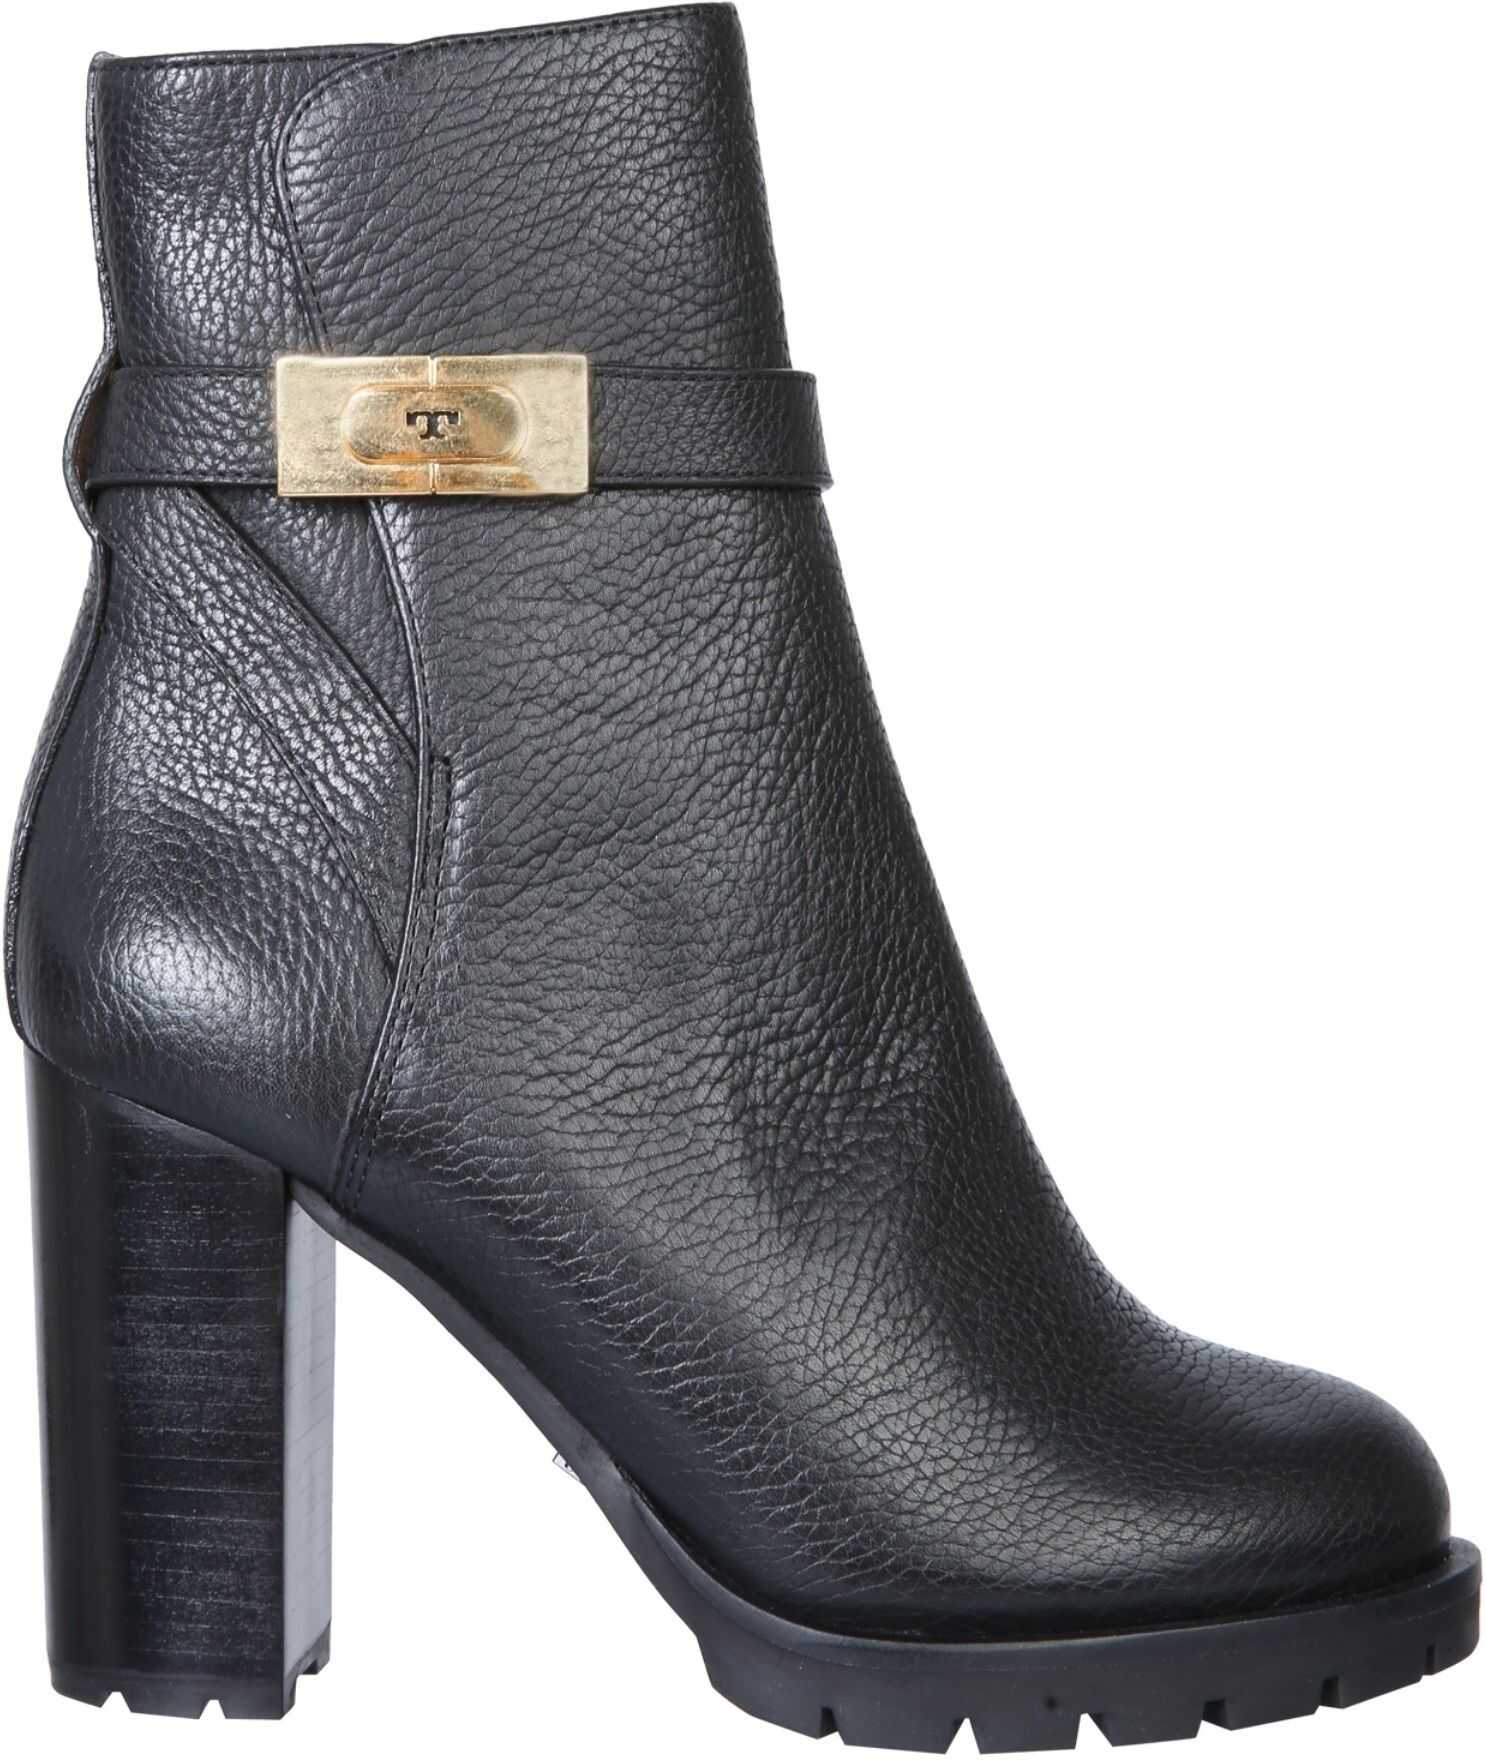 Tory Burch Boots With Logo 74355_006 BLACK imagine b-mall.ro